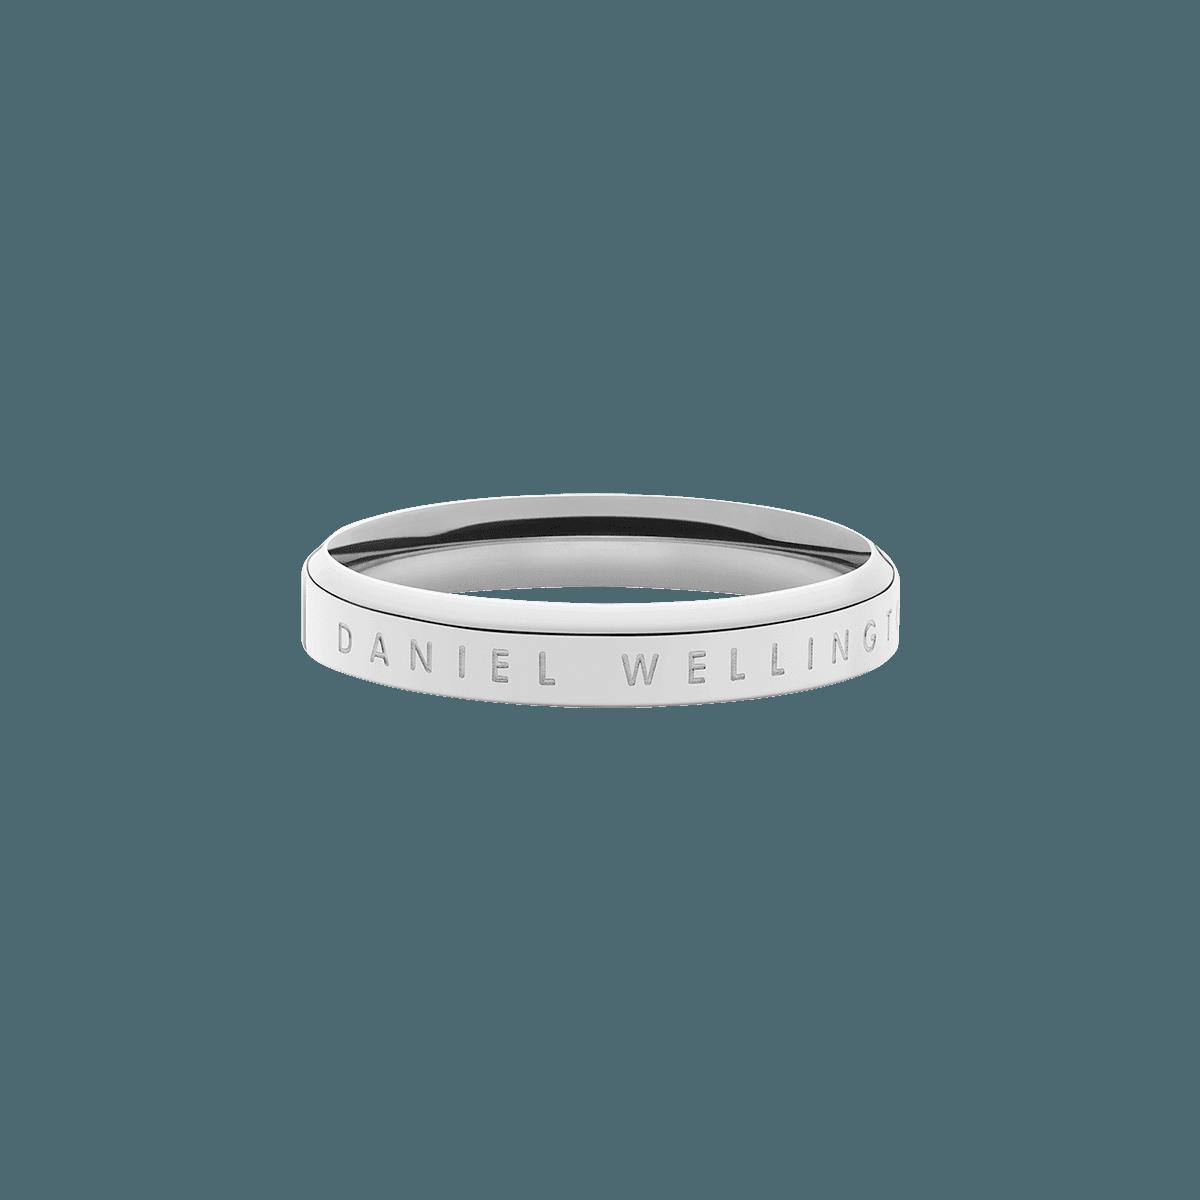 dw官网 dw手表官网 dw中国官网 dw官方旗舰店 DW DW官网  Classic Ring Silver 56mm